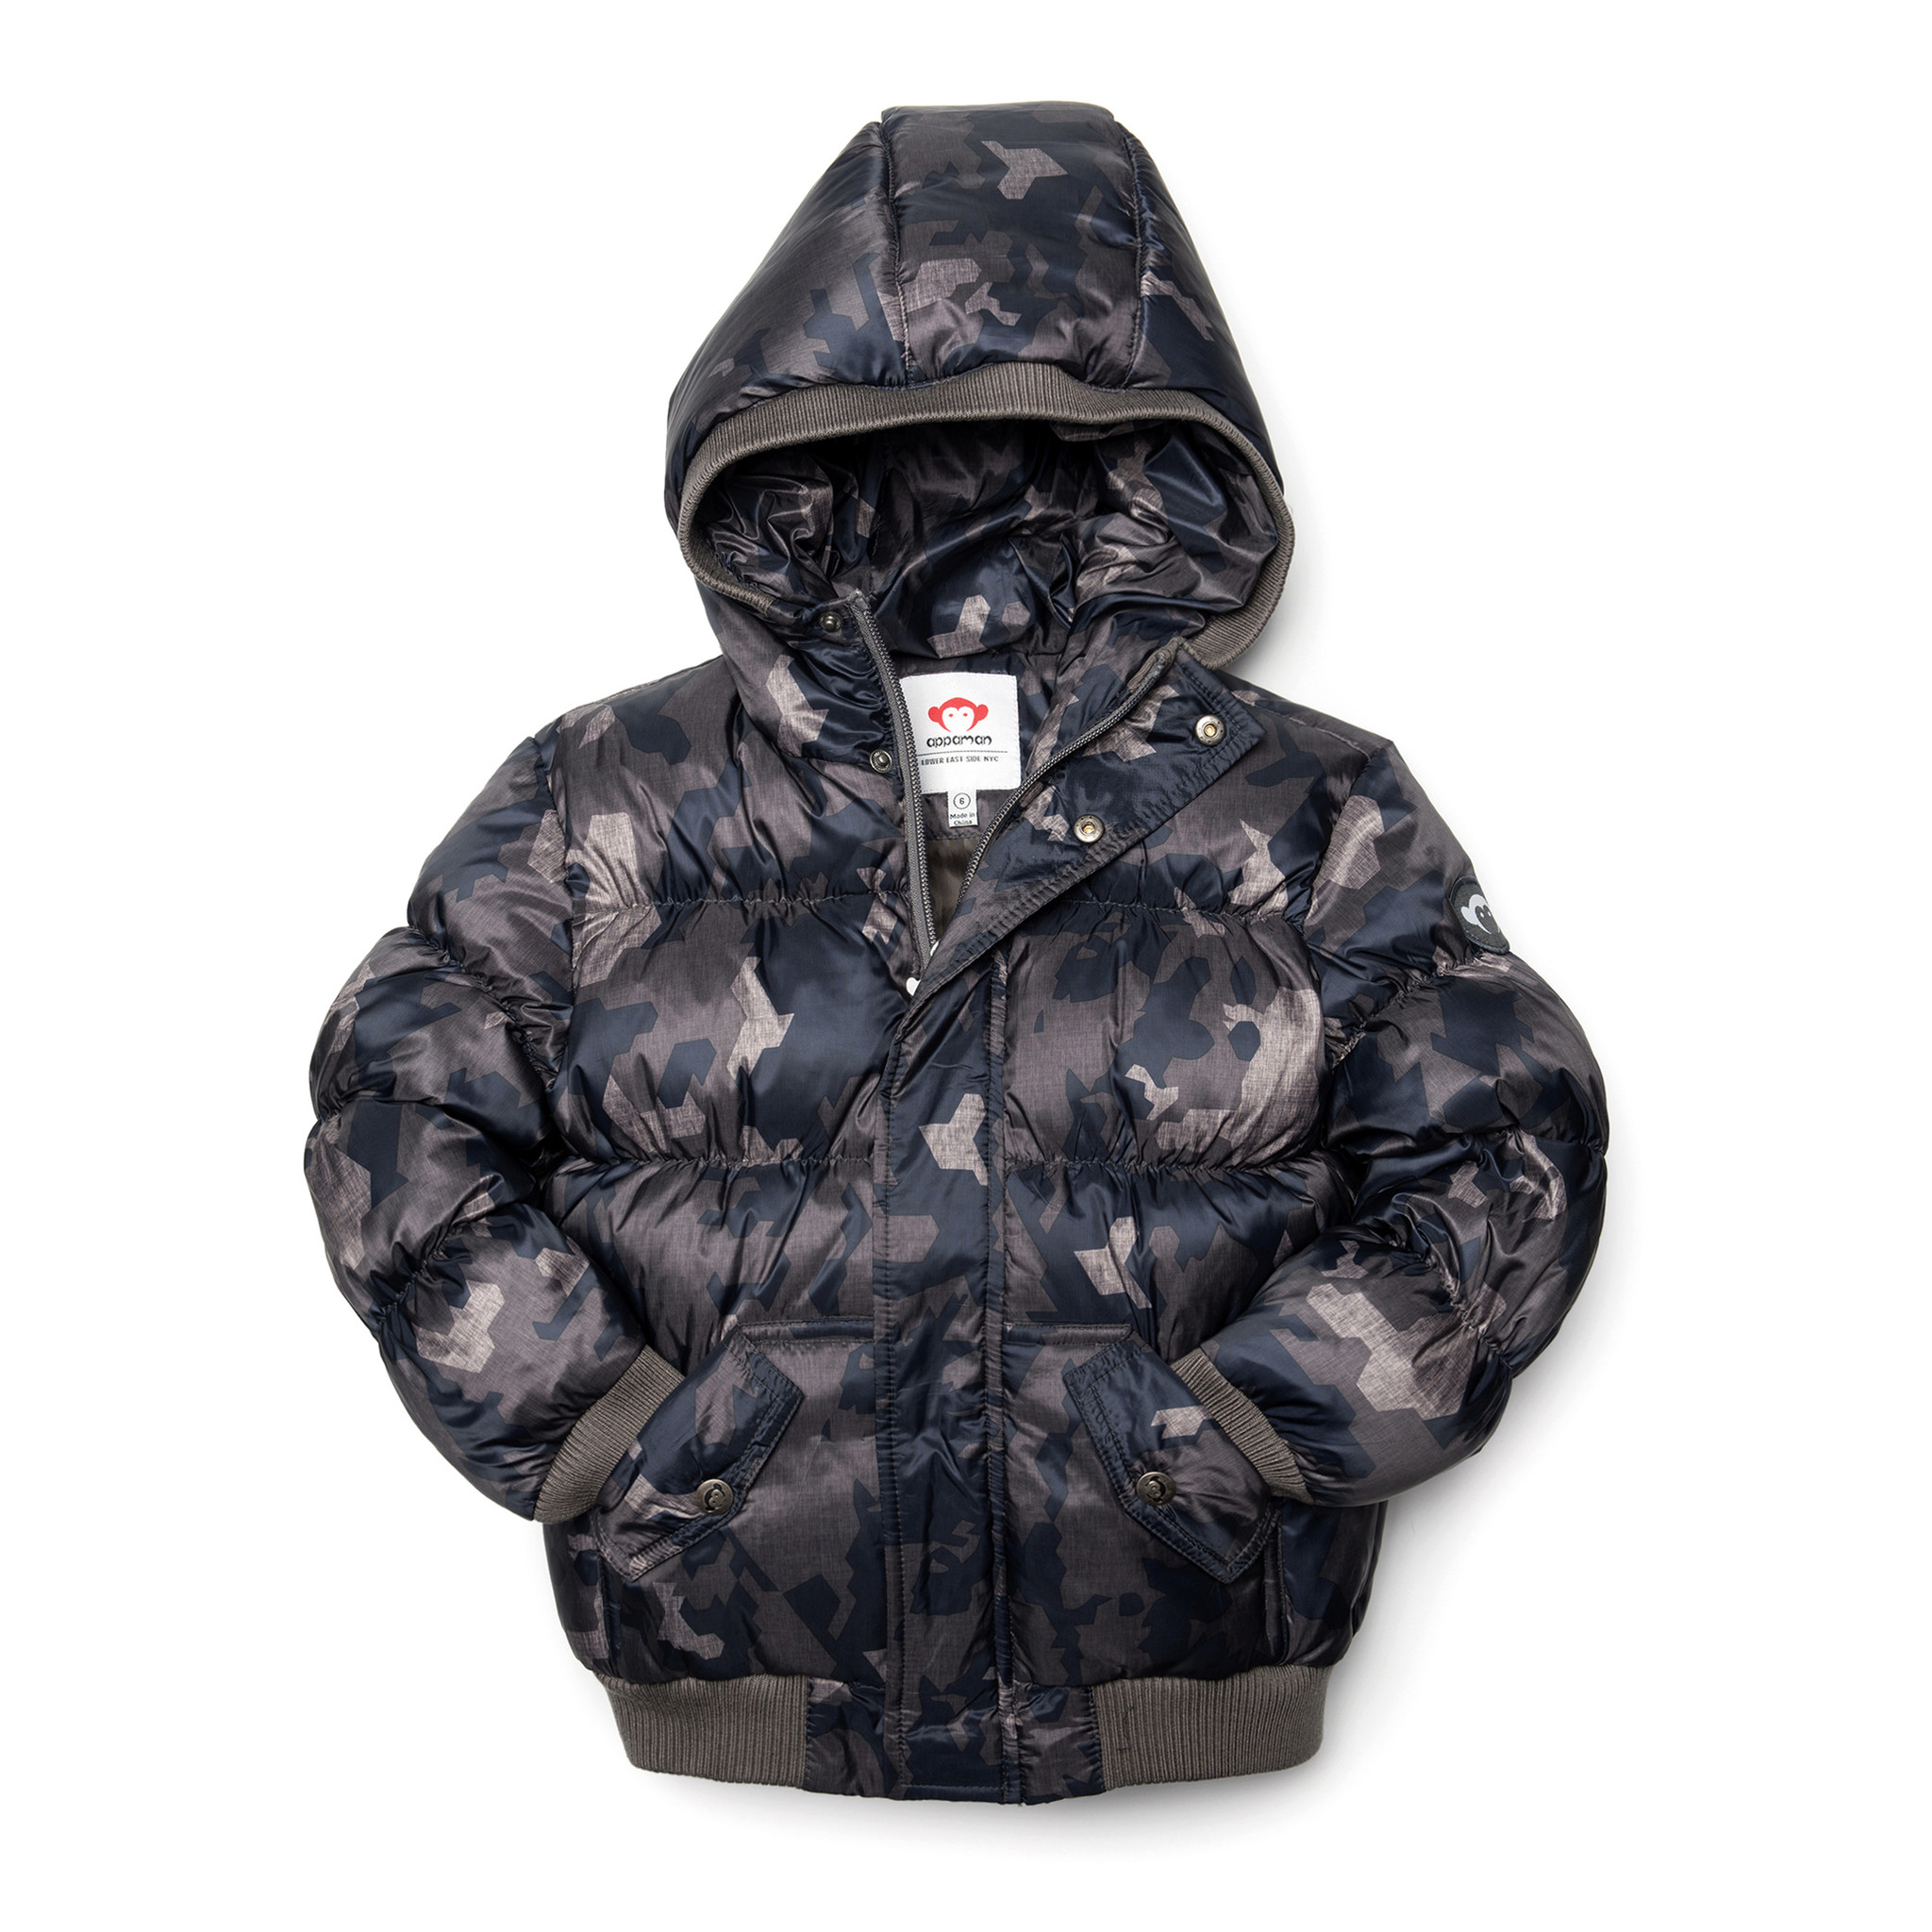 Appaman Abstract Camo Puffy Coat